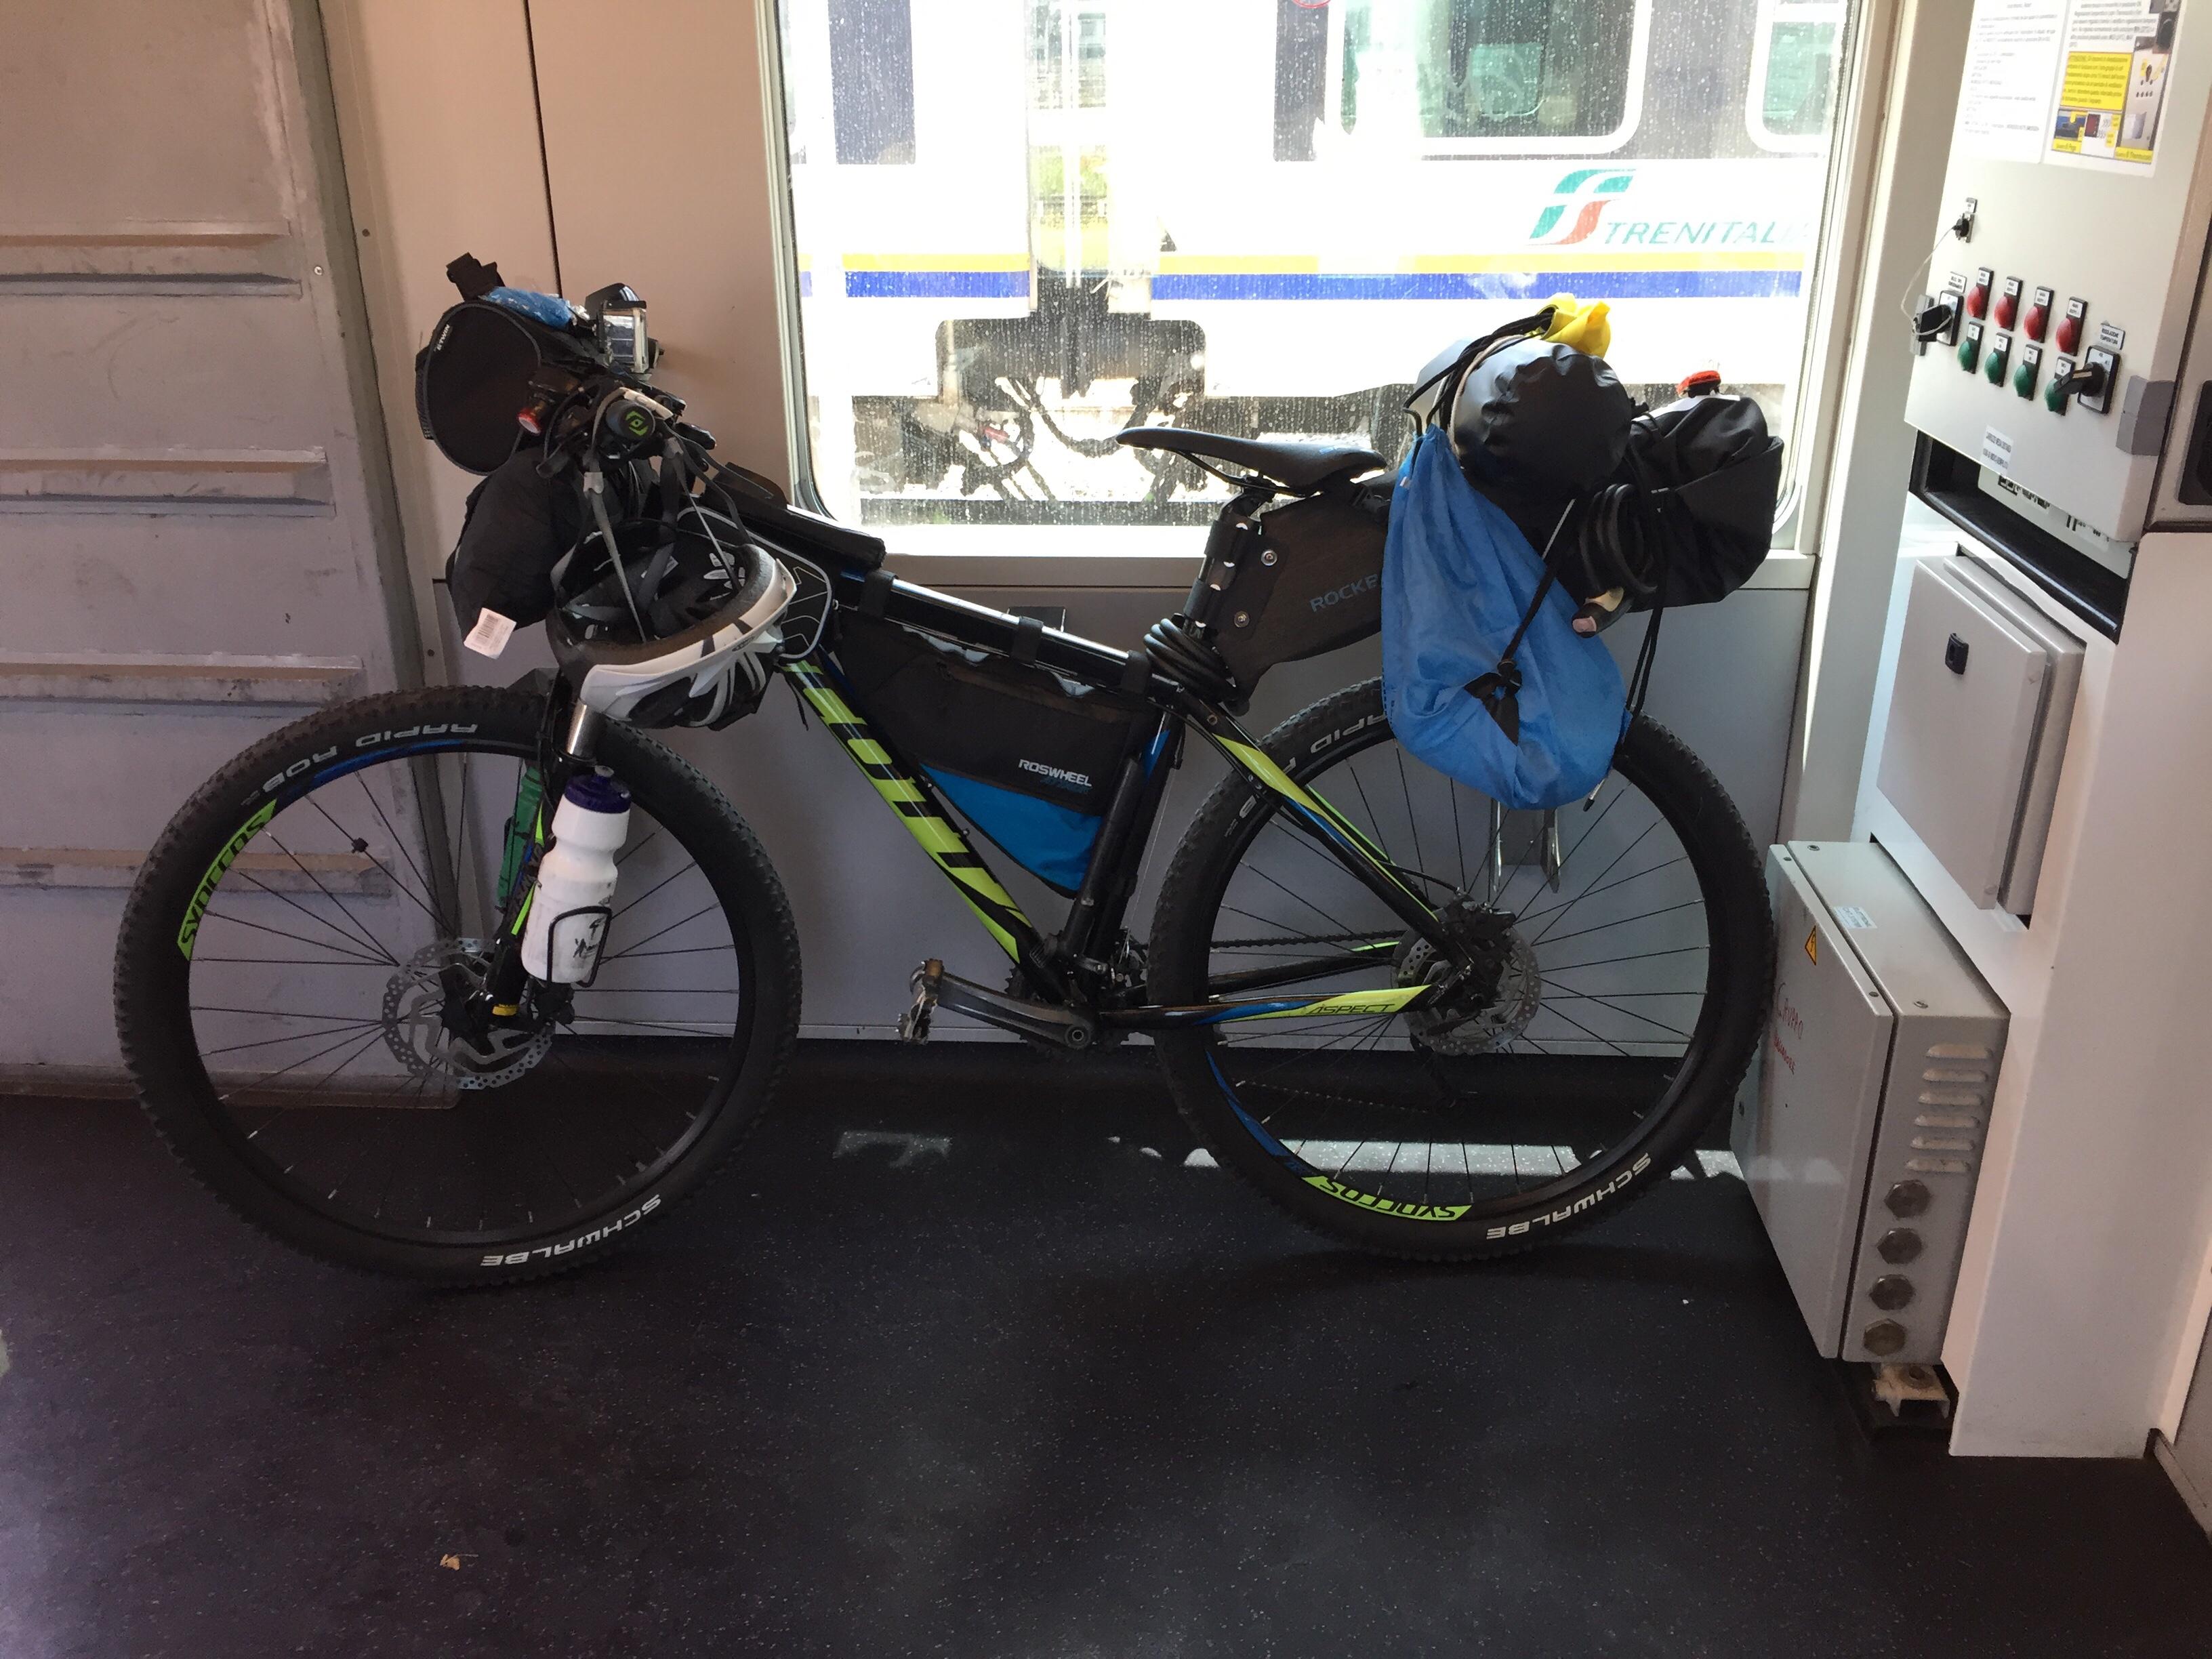 tuscany trail massa toscana bici